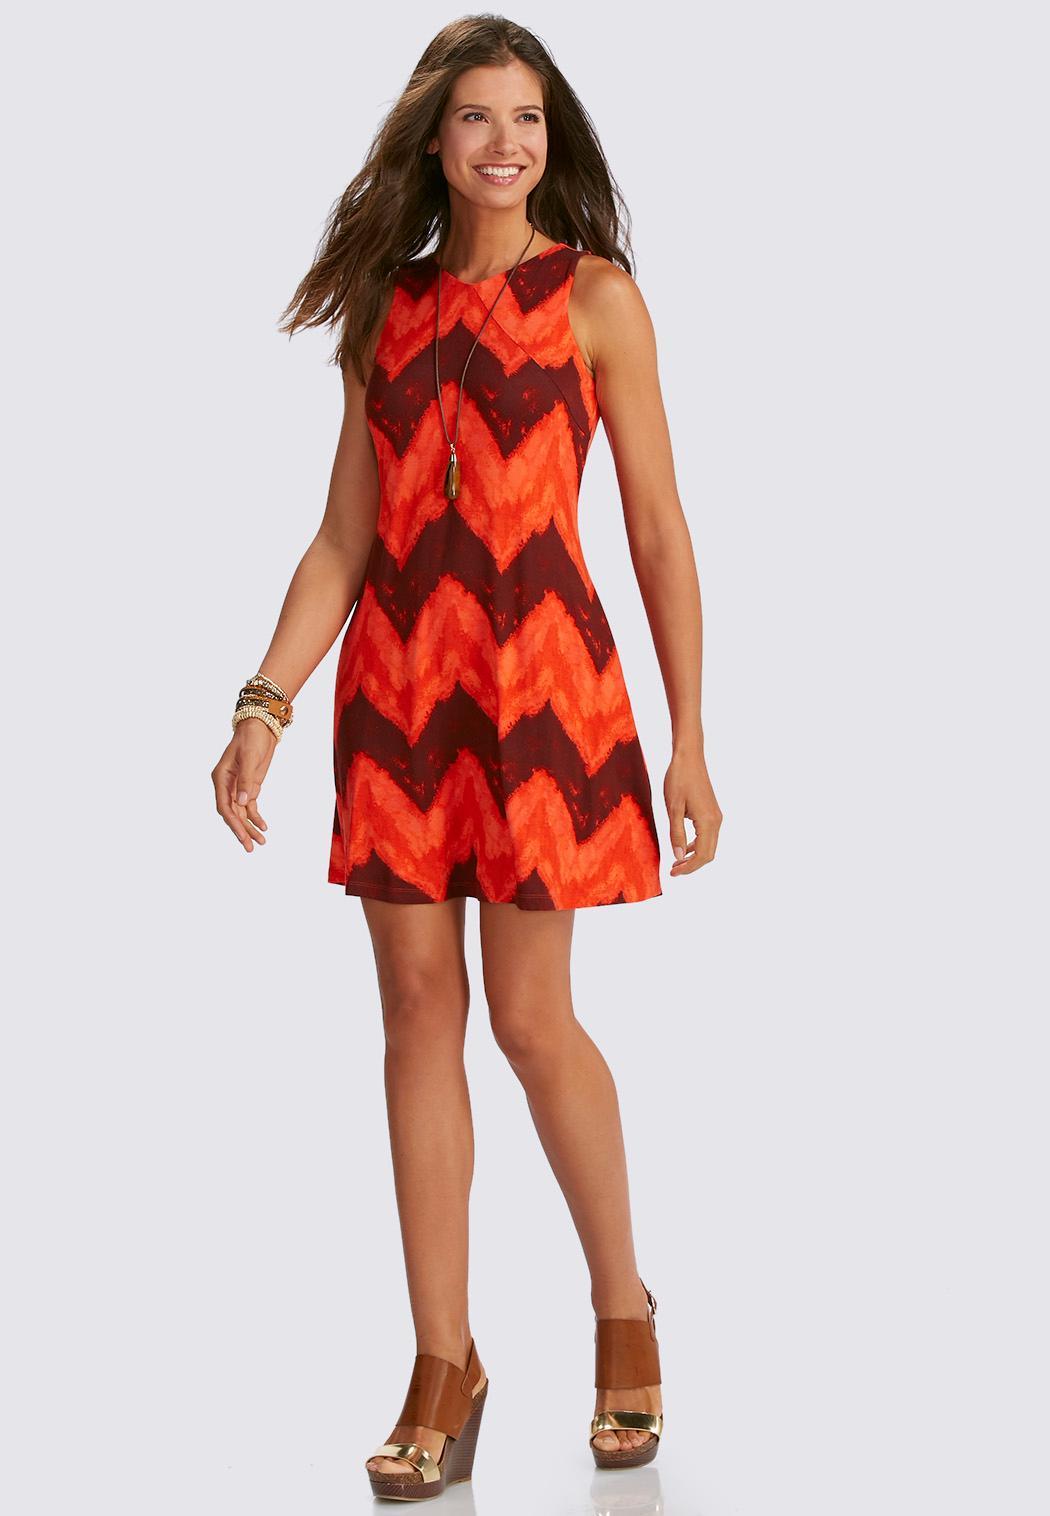 Women's Dresses | Cato Fashions